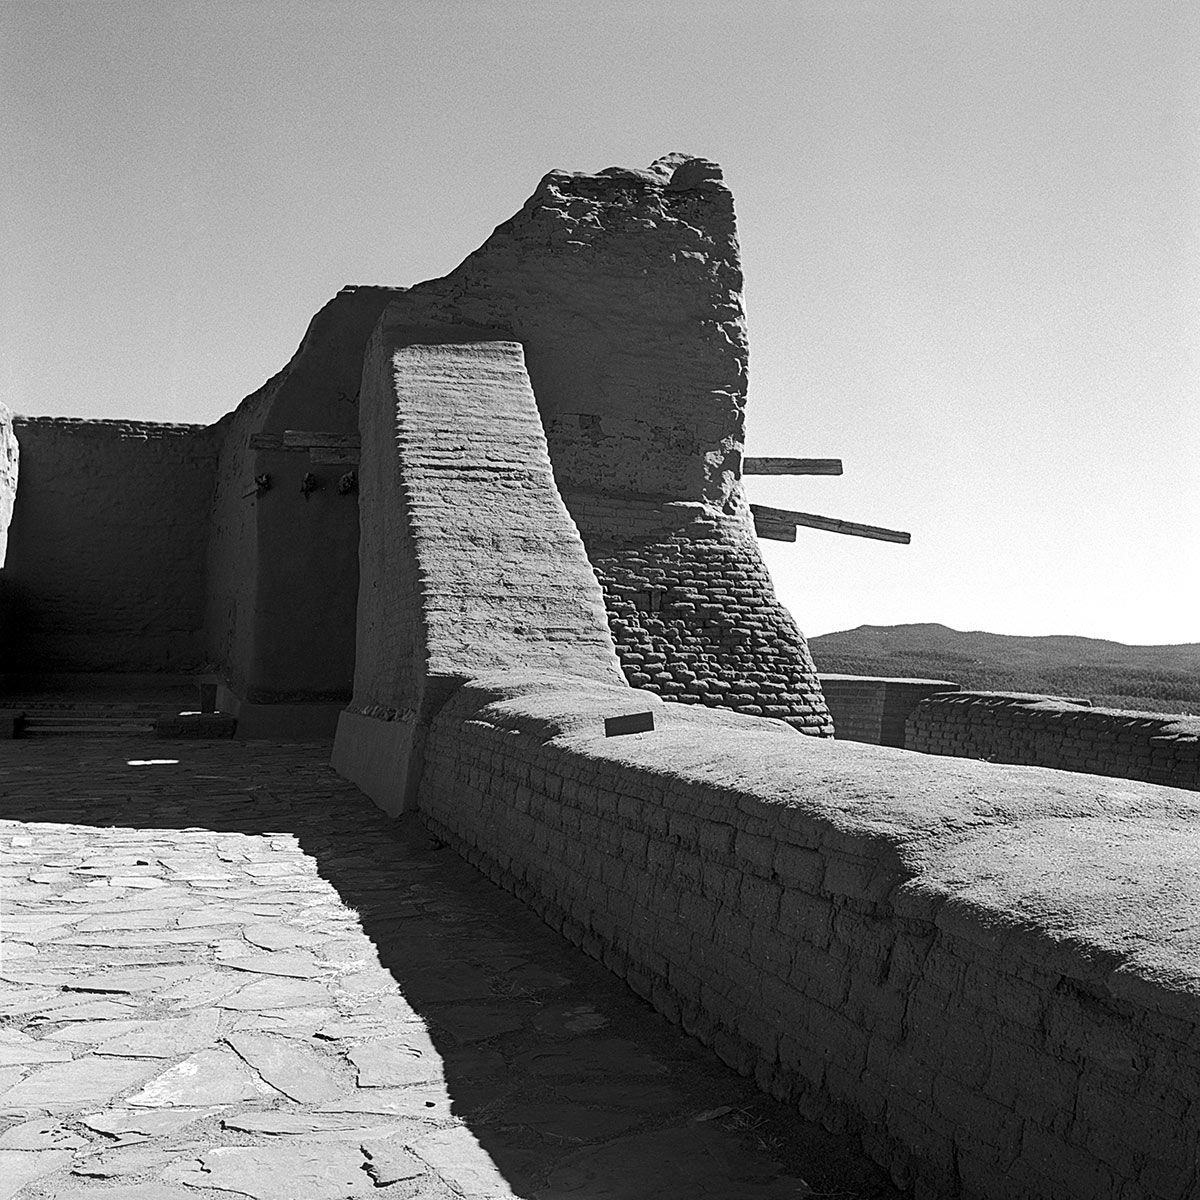 Pecos Heritage Site